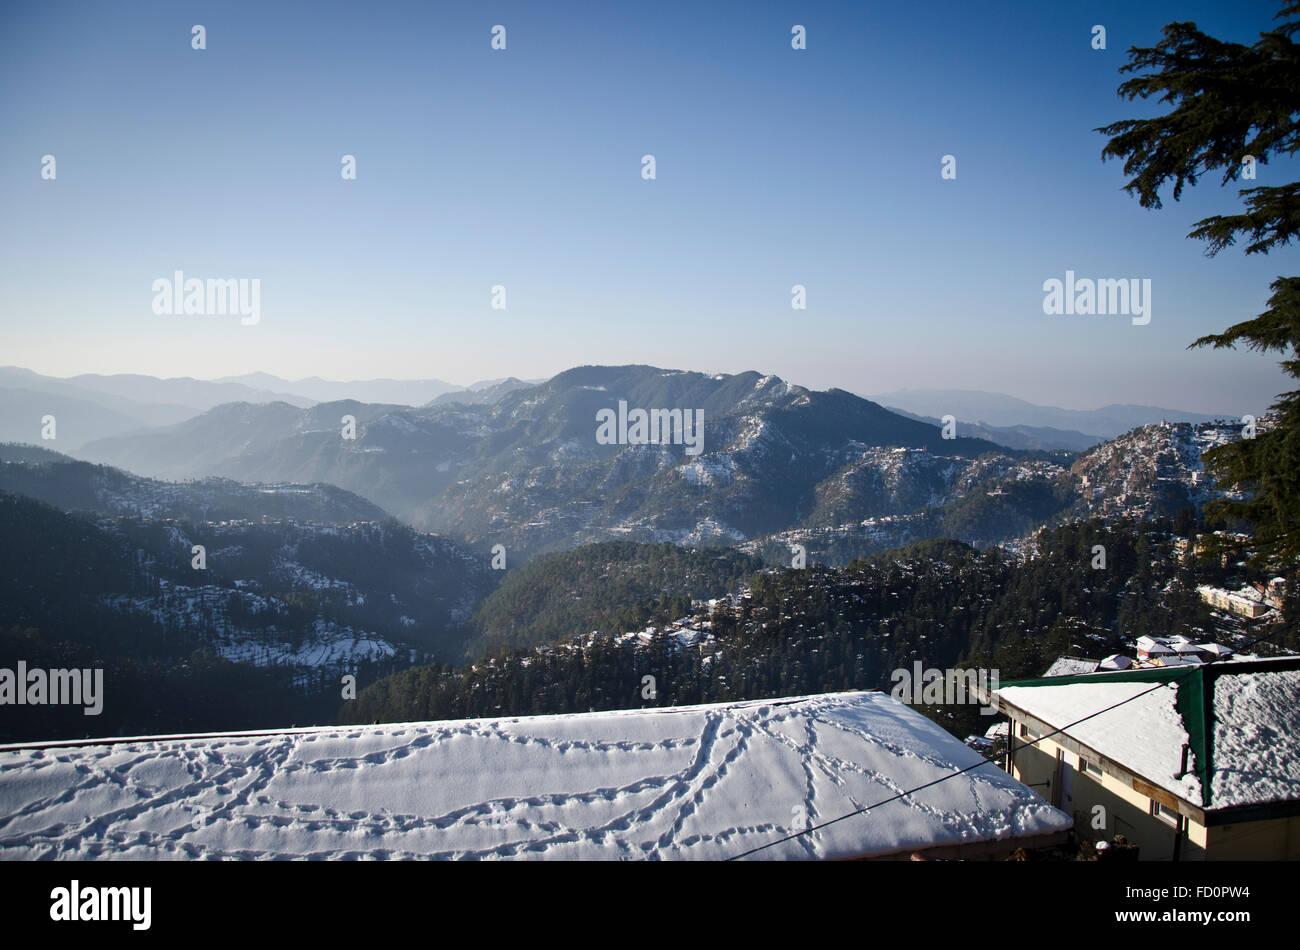 Monkey footprints, Shimla in winter, Himachal Pradesh, India - Stock Image